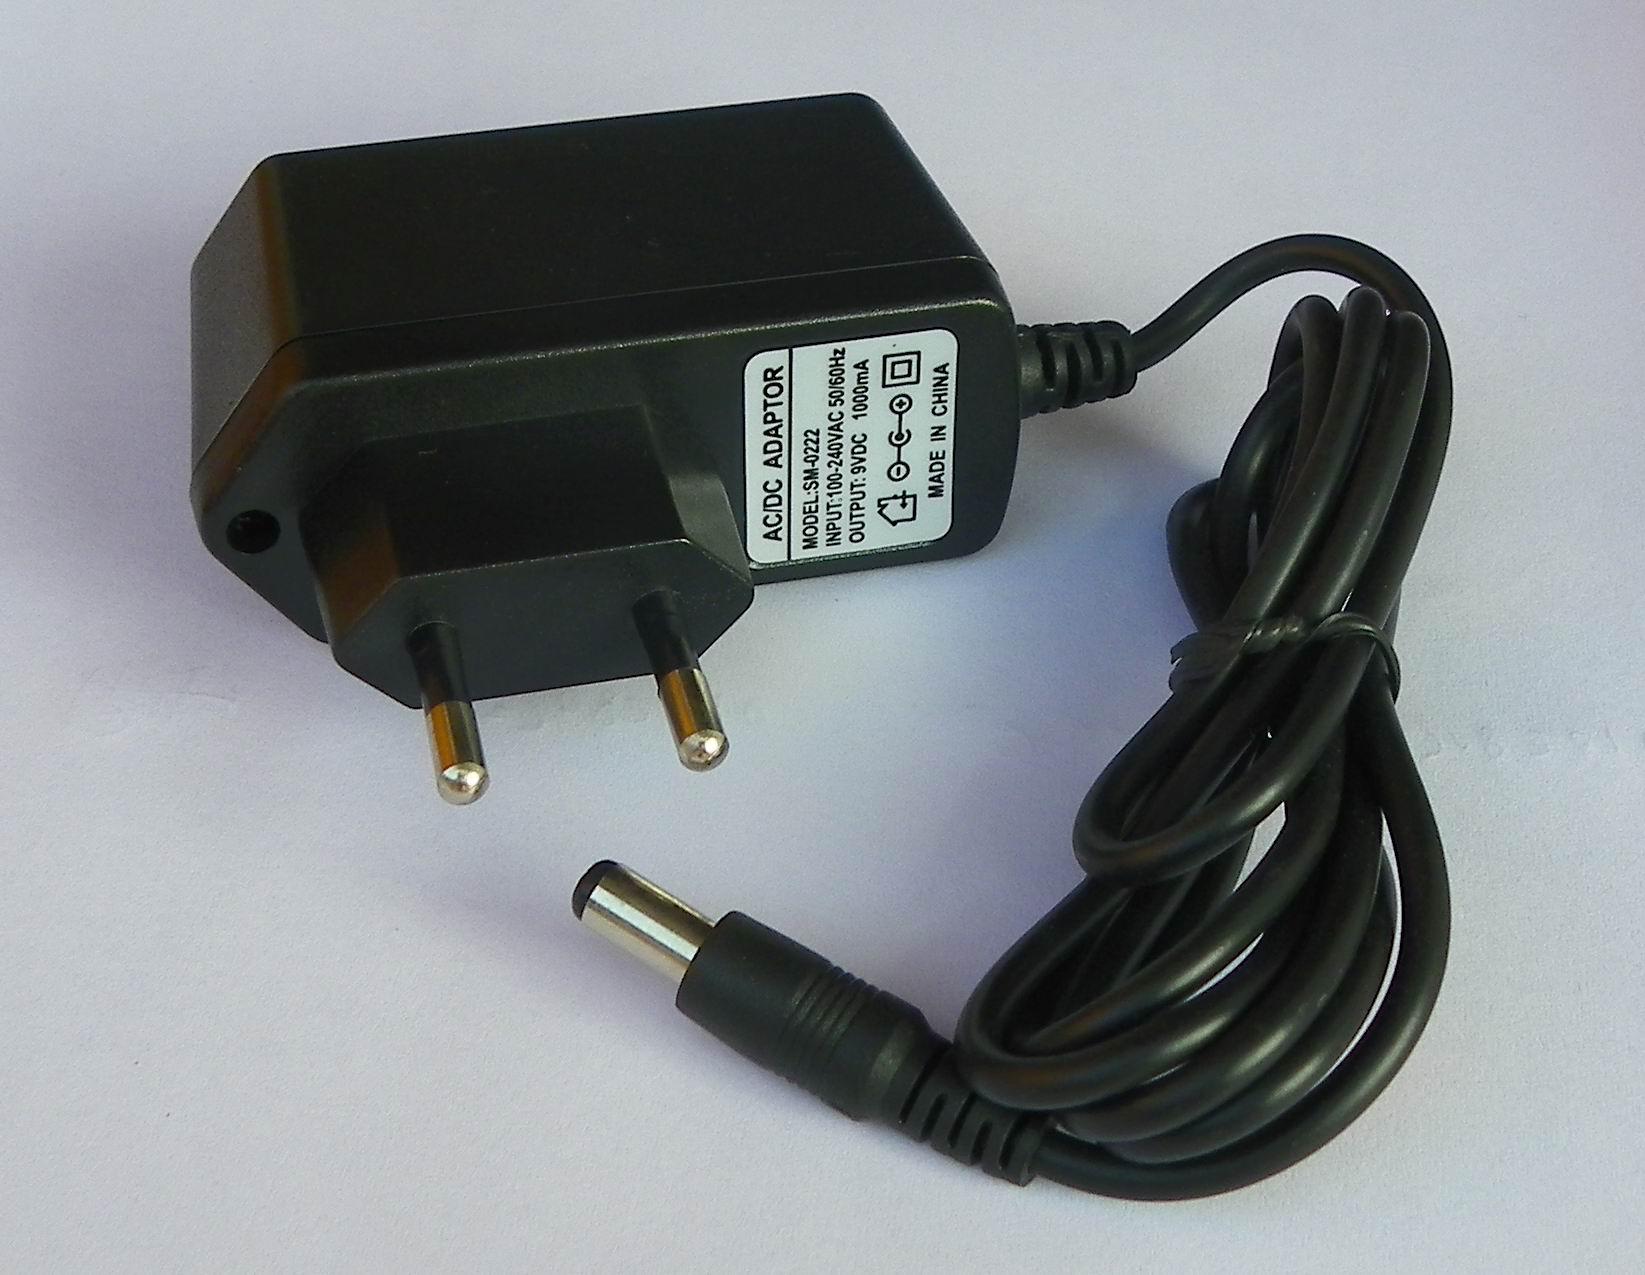 Jye Tech Diy Oscilloscopes Kits For Hobbyists Digital Storage Oscilloscope Adapter Accessories